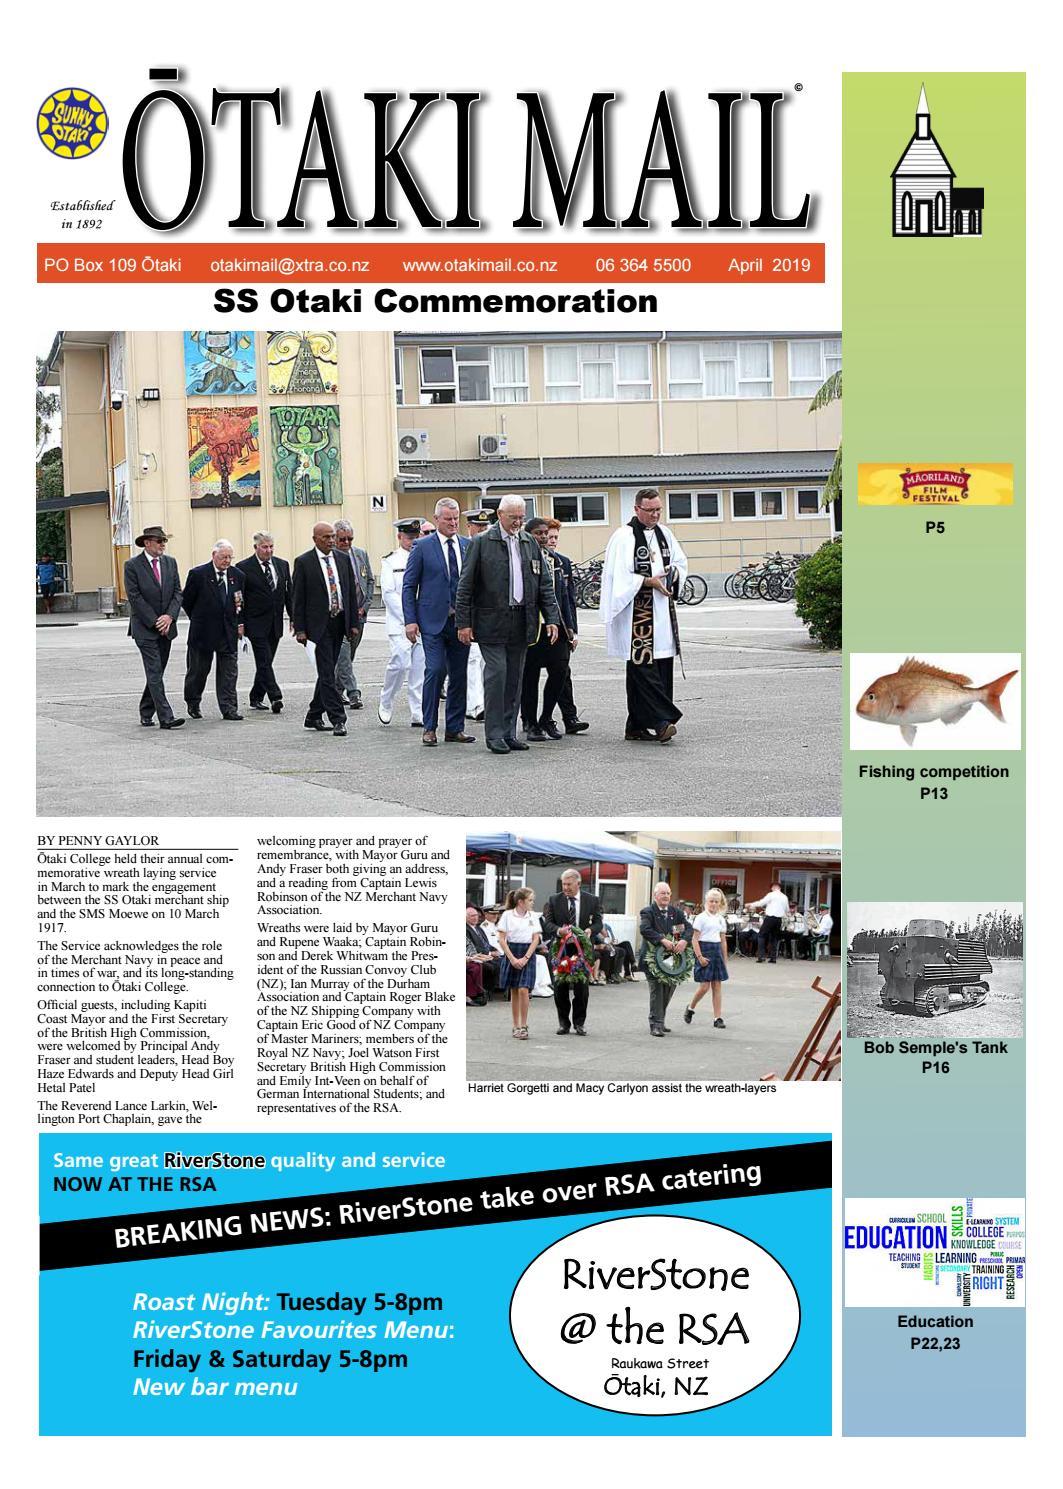 Otaki Mail April 2019 by Otaki Mail - issuu